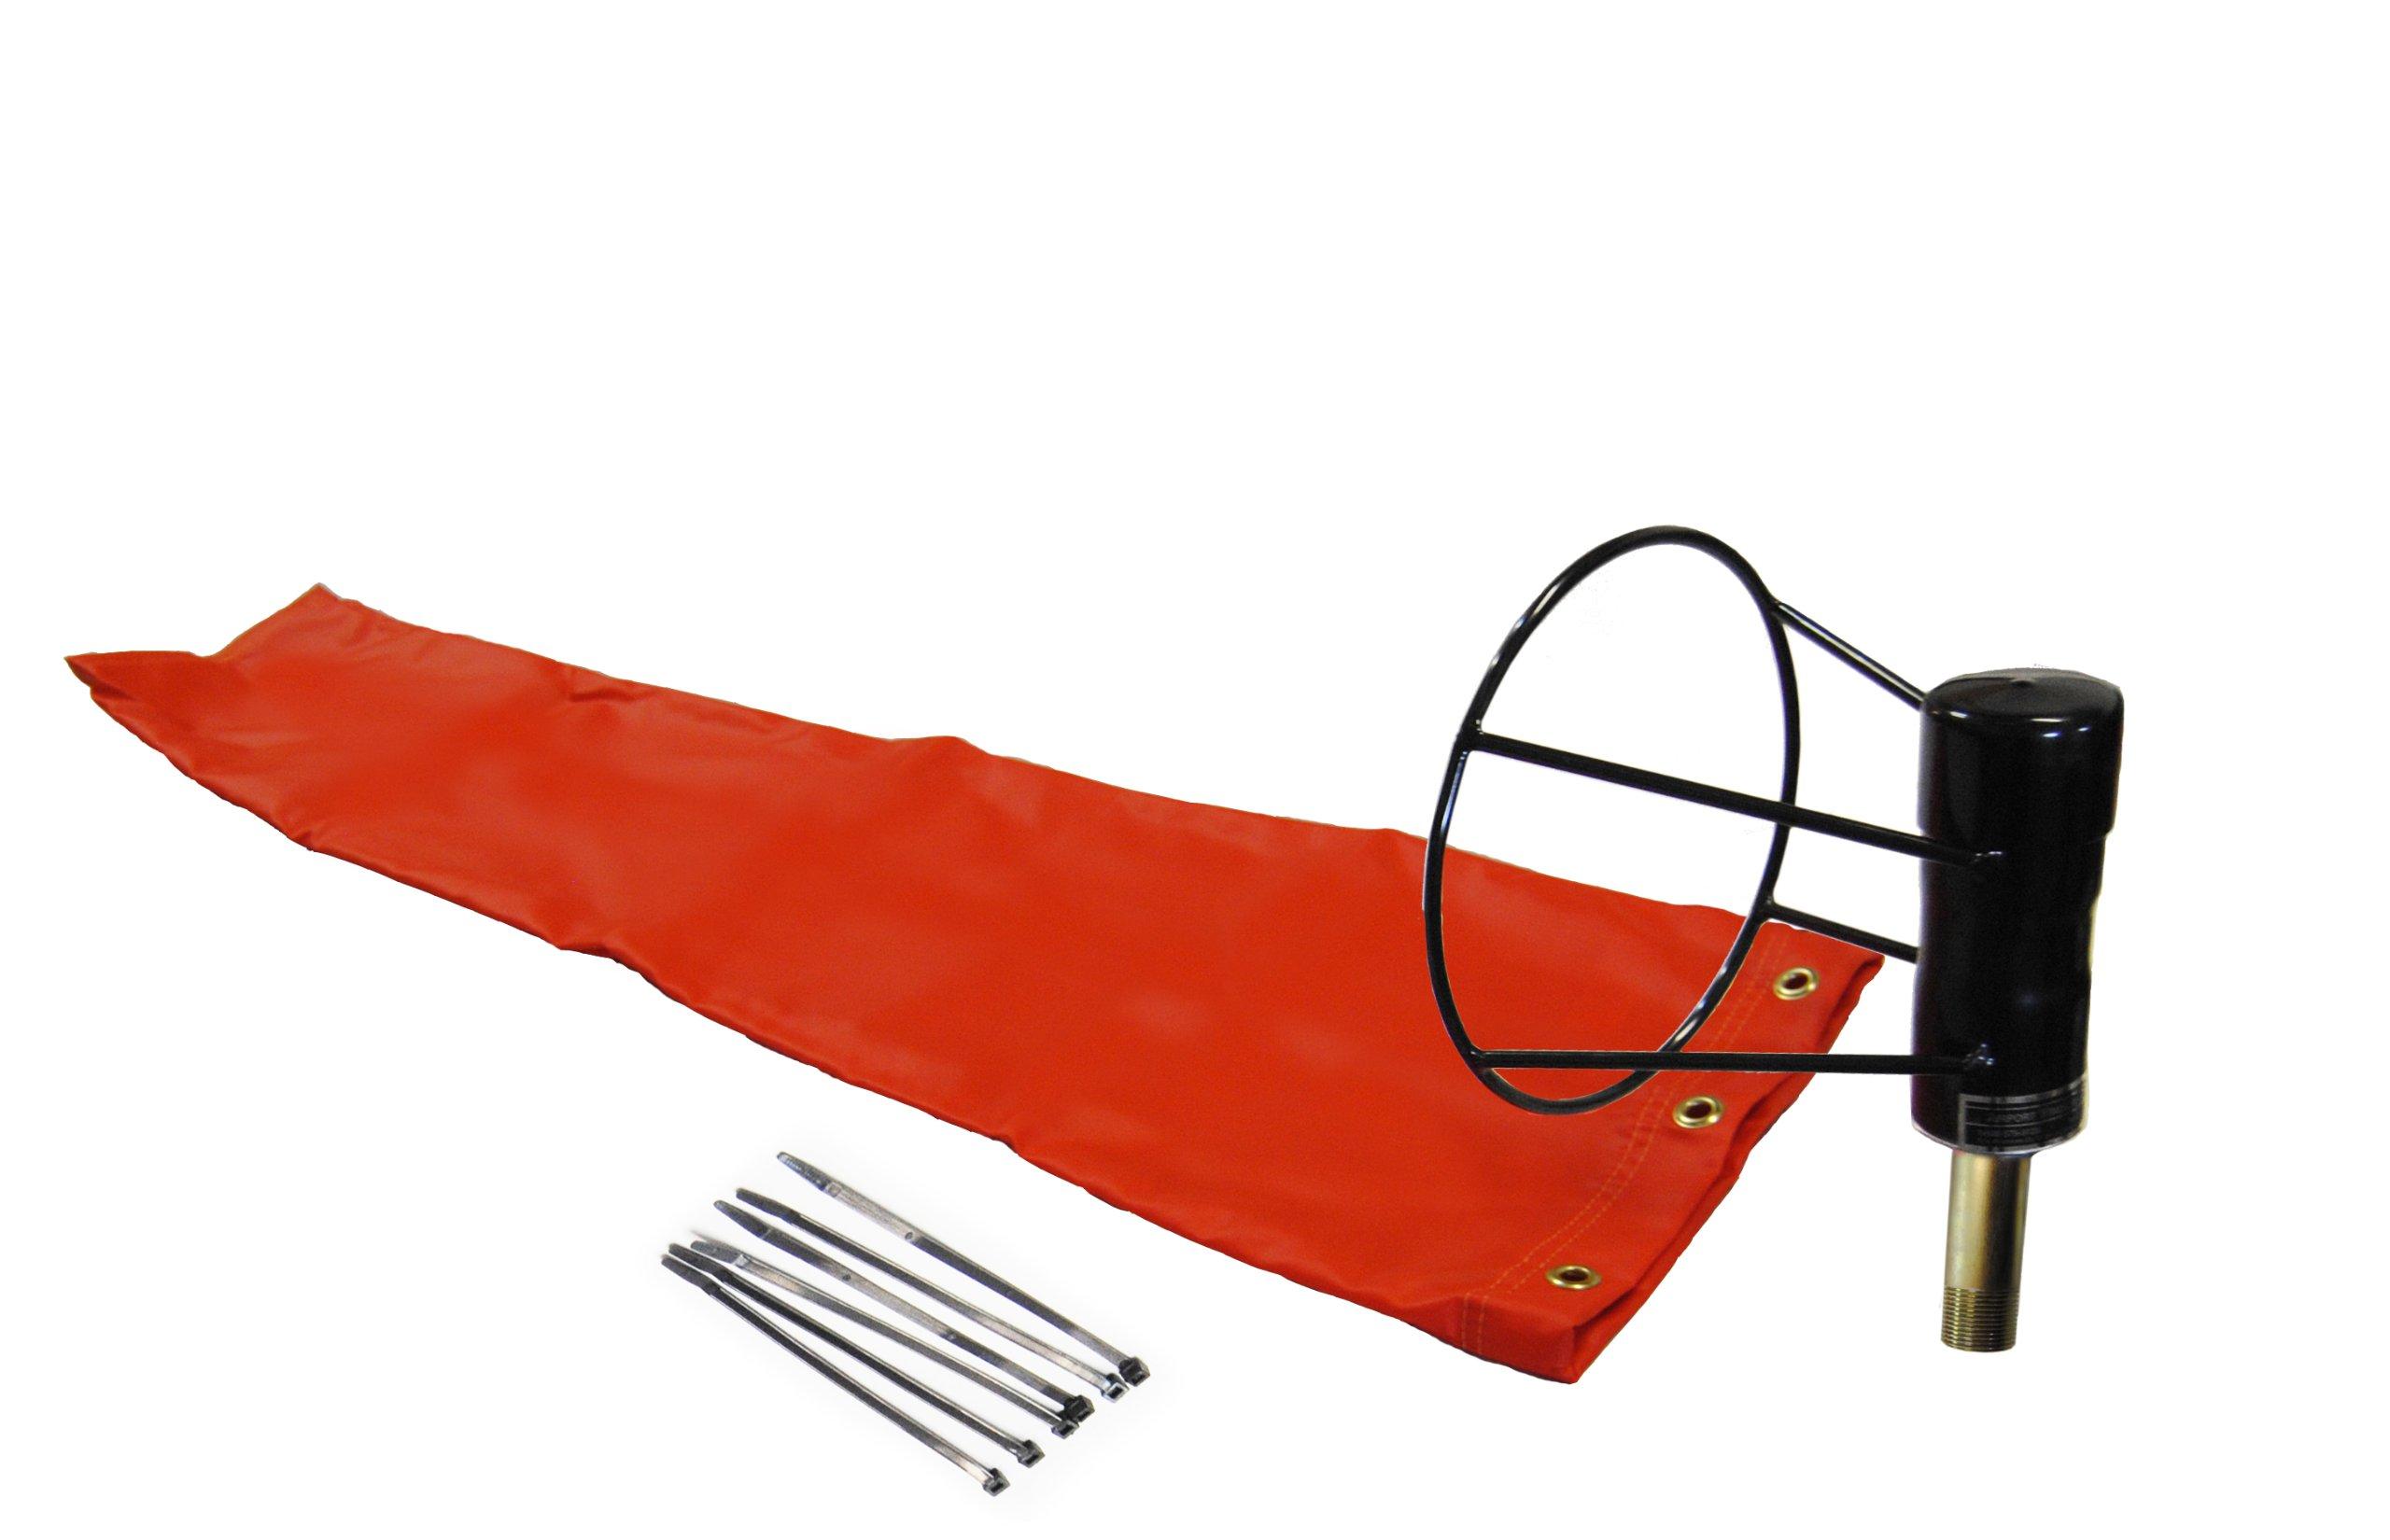 Airport Windsock Corporation 8'' X 36'' Orange Windsock and 8'' Ball Bearing Frame USA Made